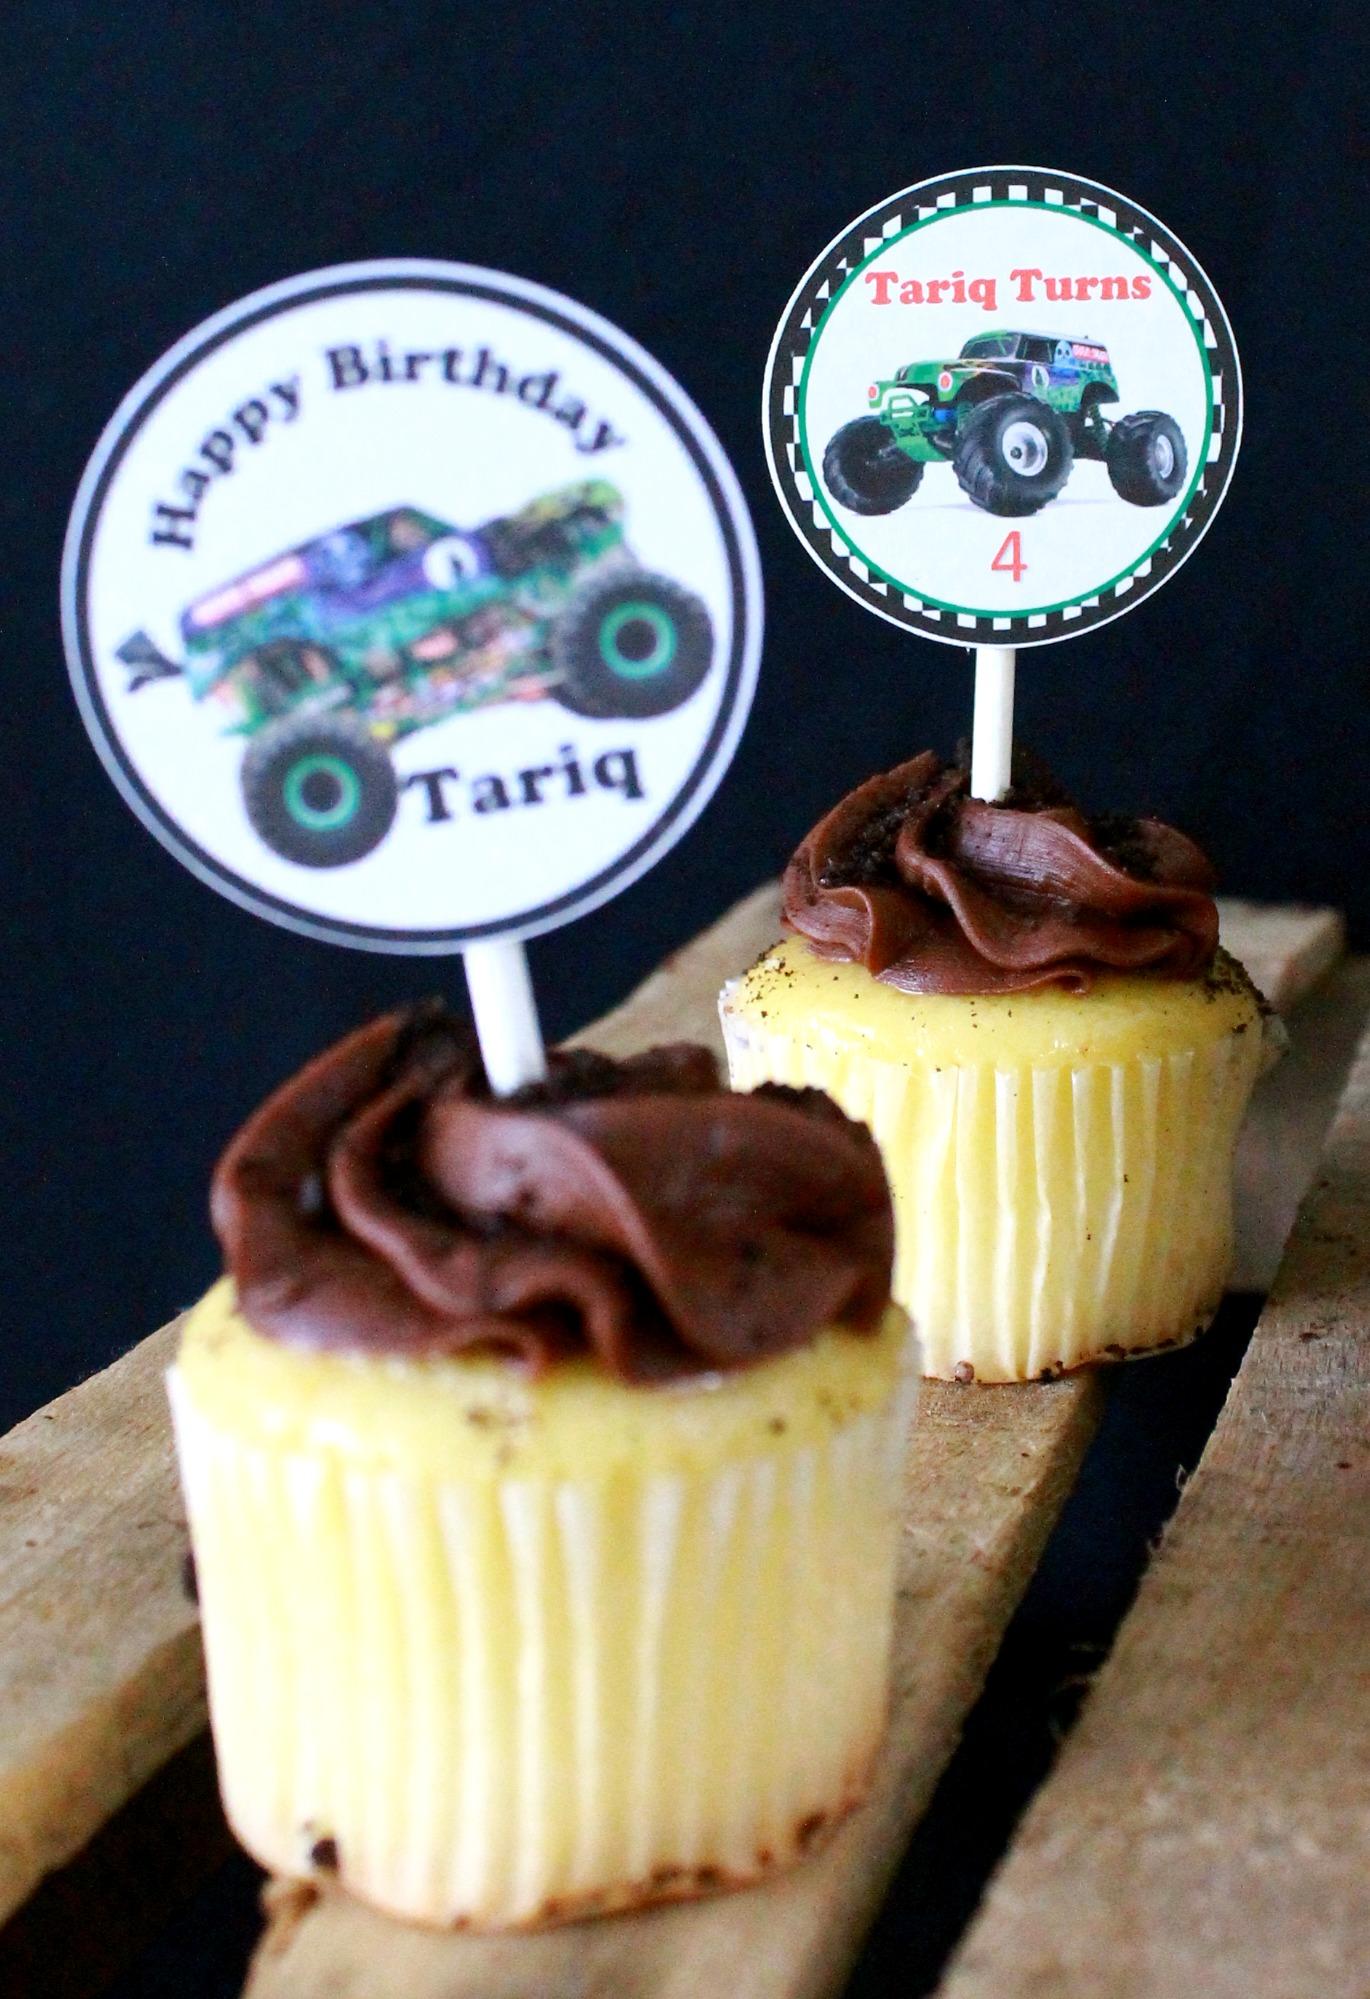 Monster Truck birthday-monster truck toppers-grave digger-cupcake topper ideas-monster truck cupcakes-www.SugarPartiesLA.com.jpg